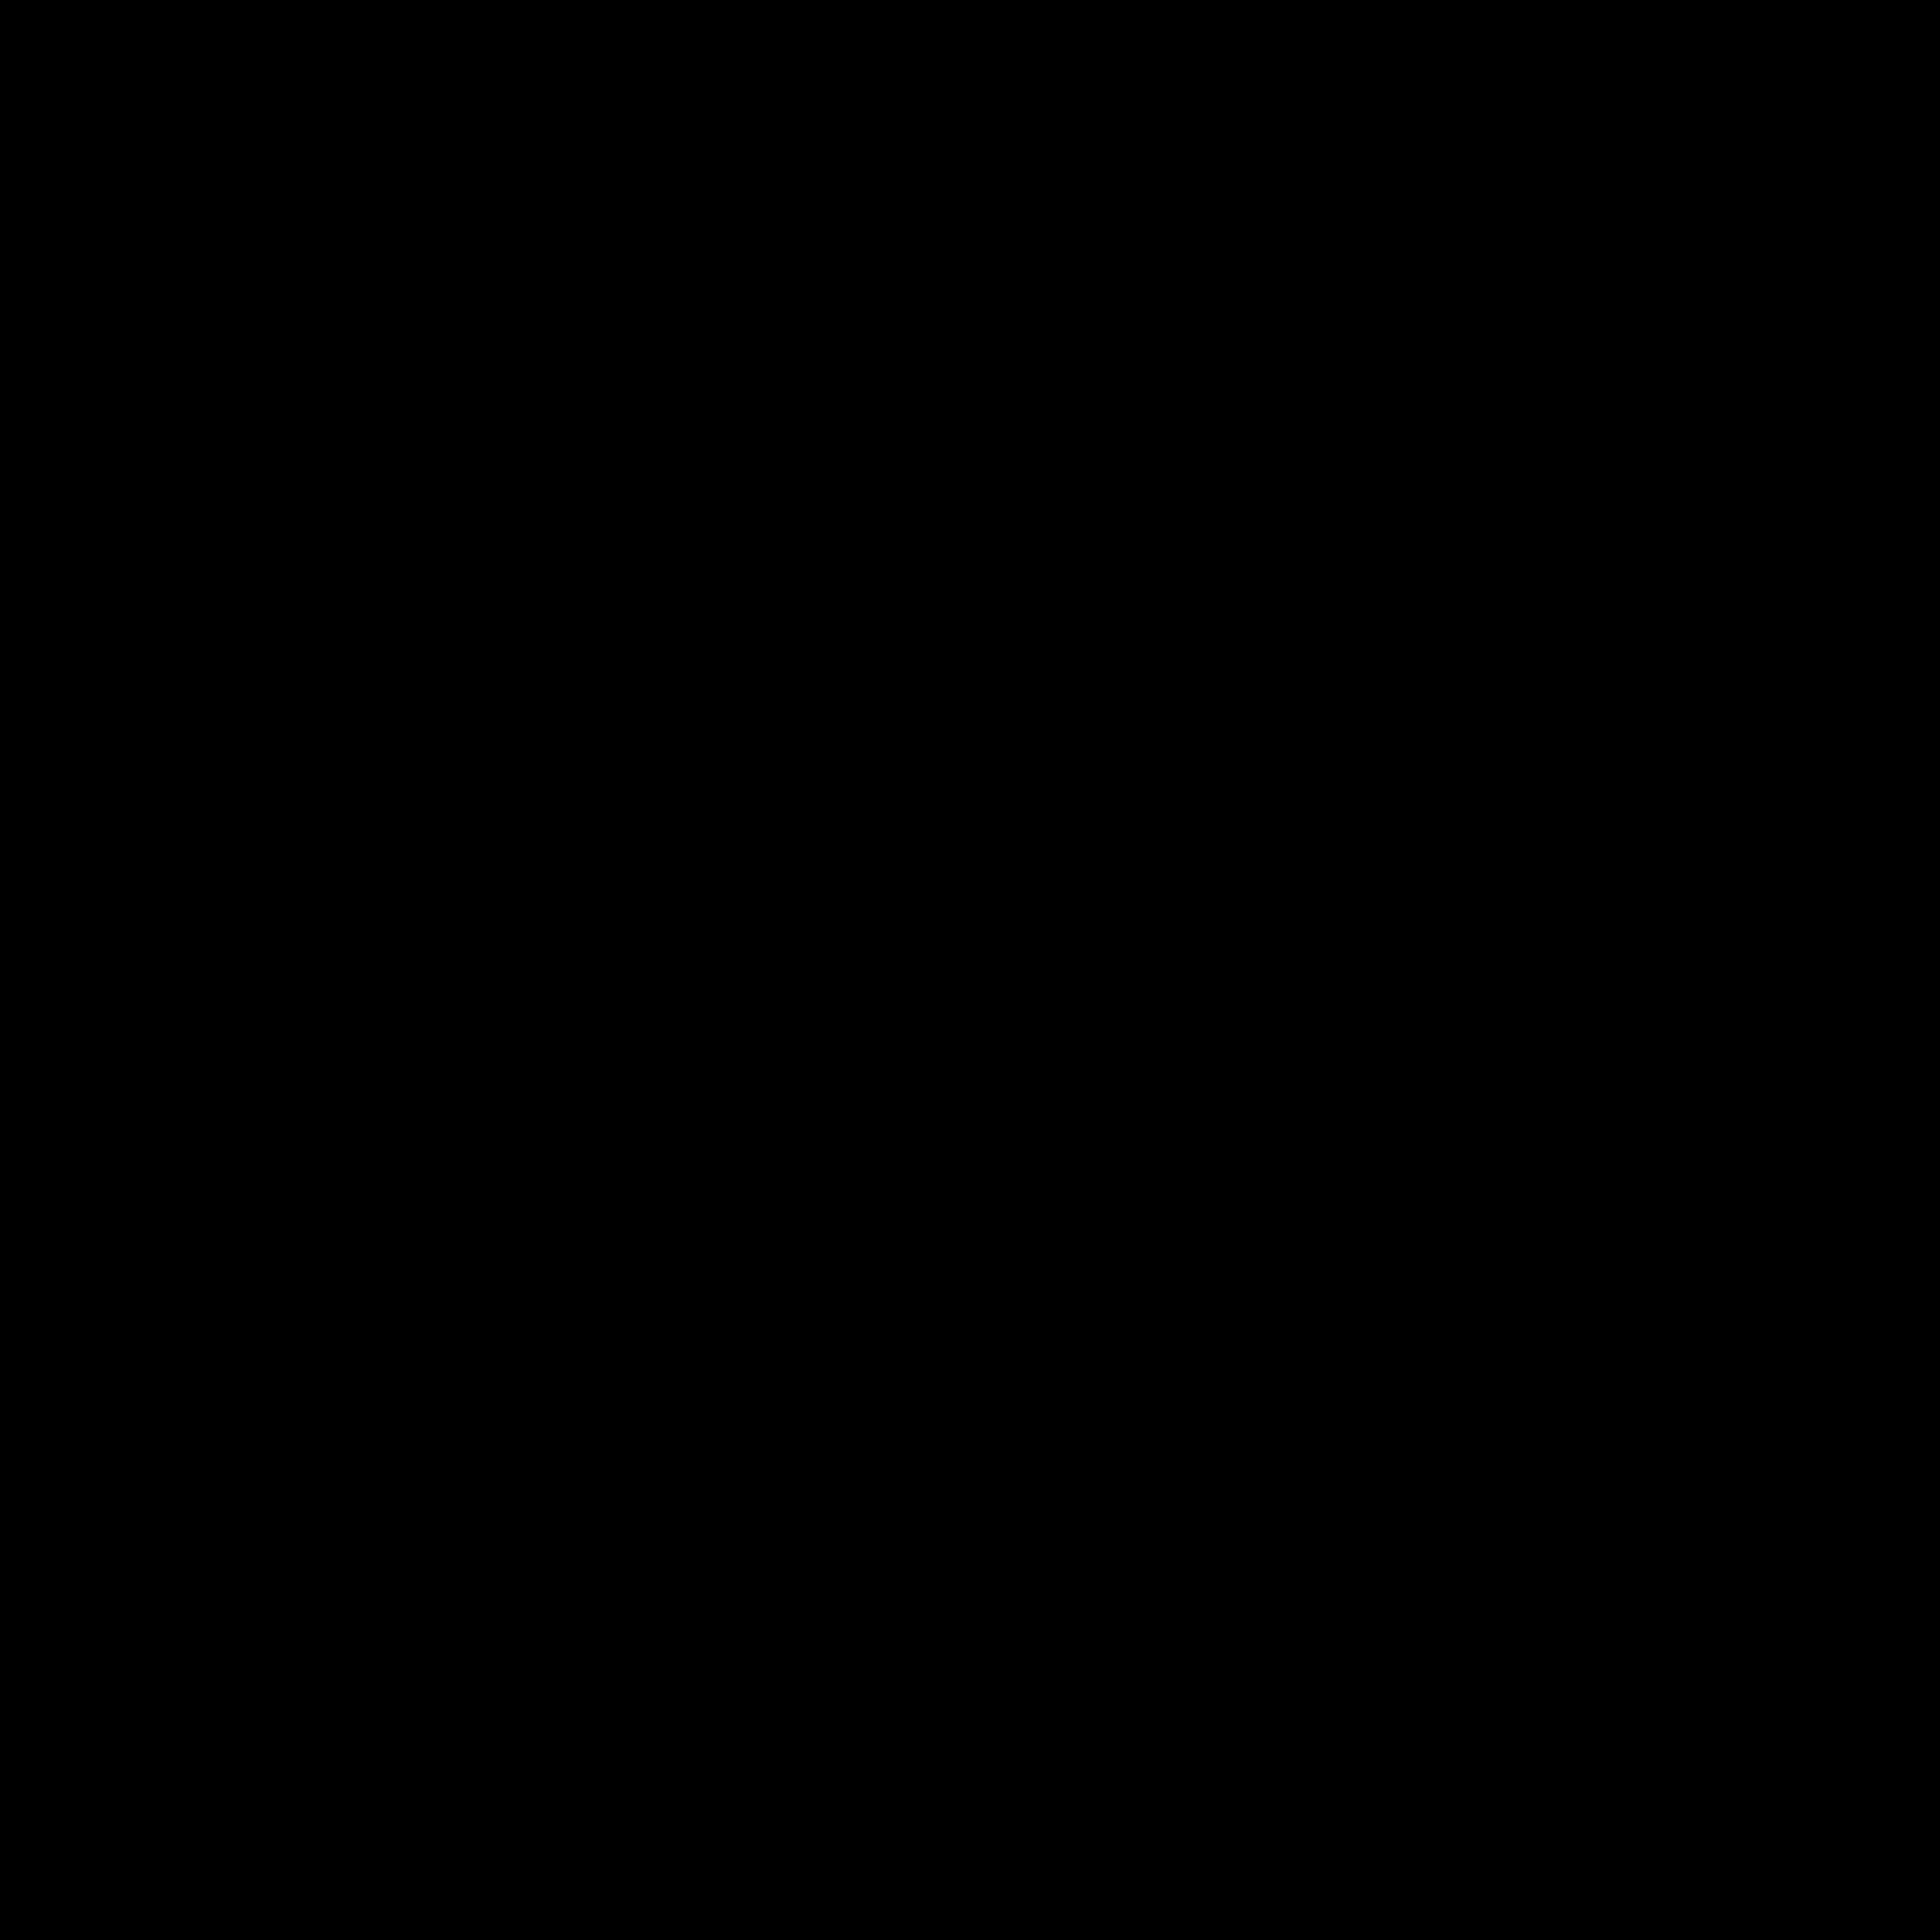 Compass clipart rustic. Simple rose desktop backgrounds